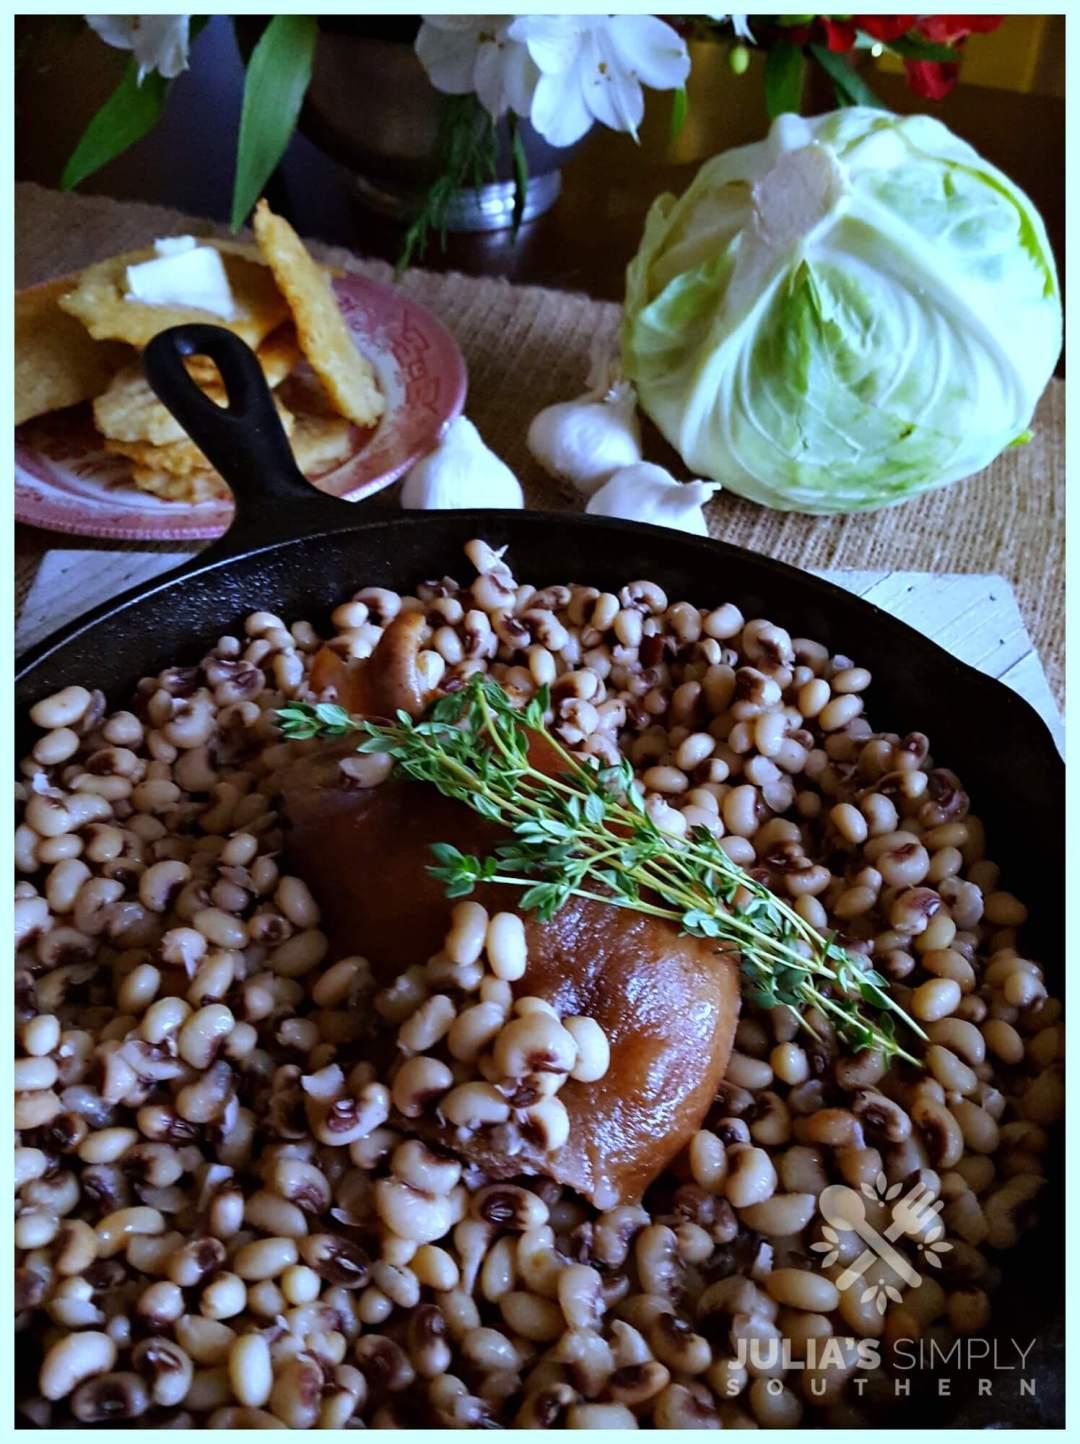 How to cook purple hull peas